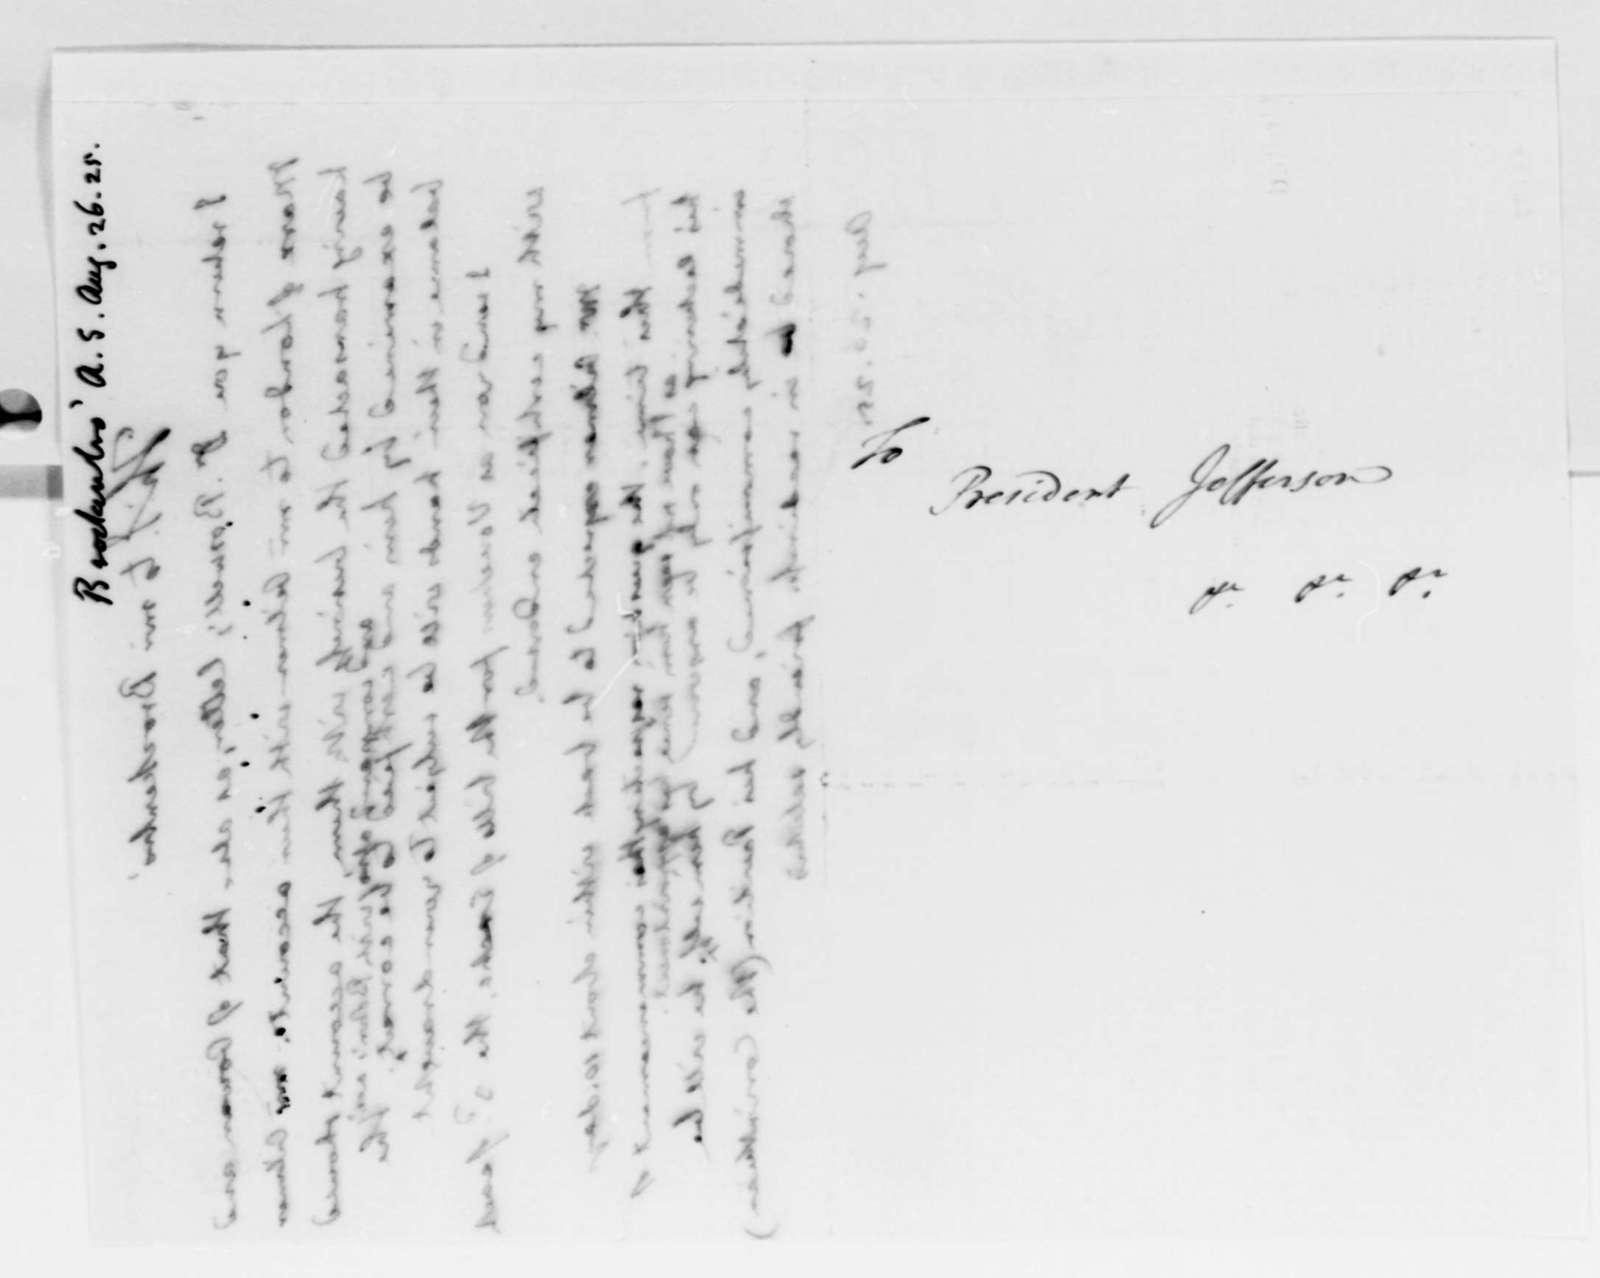 Thomas Jefferson to Arthur S. Brockenbrough, August 26, 1825